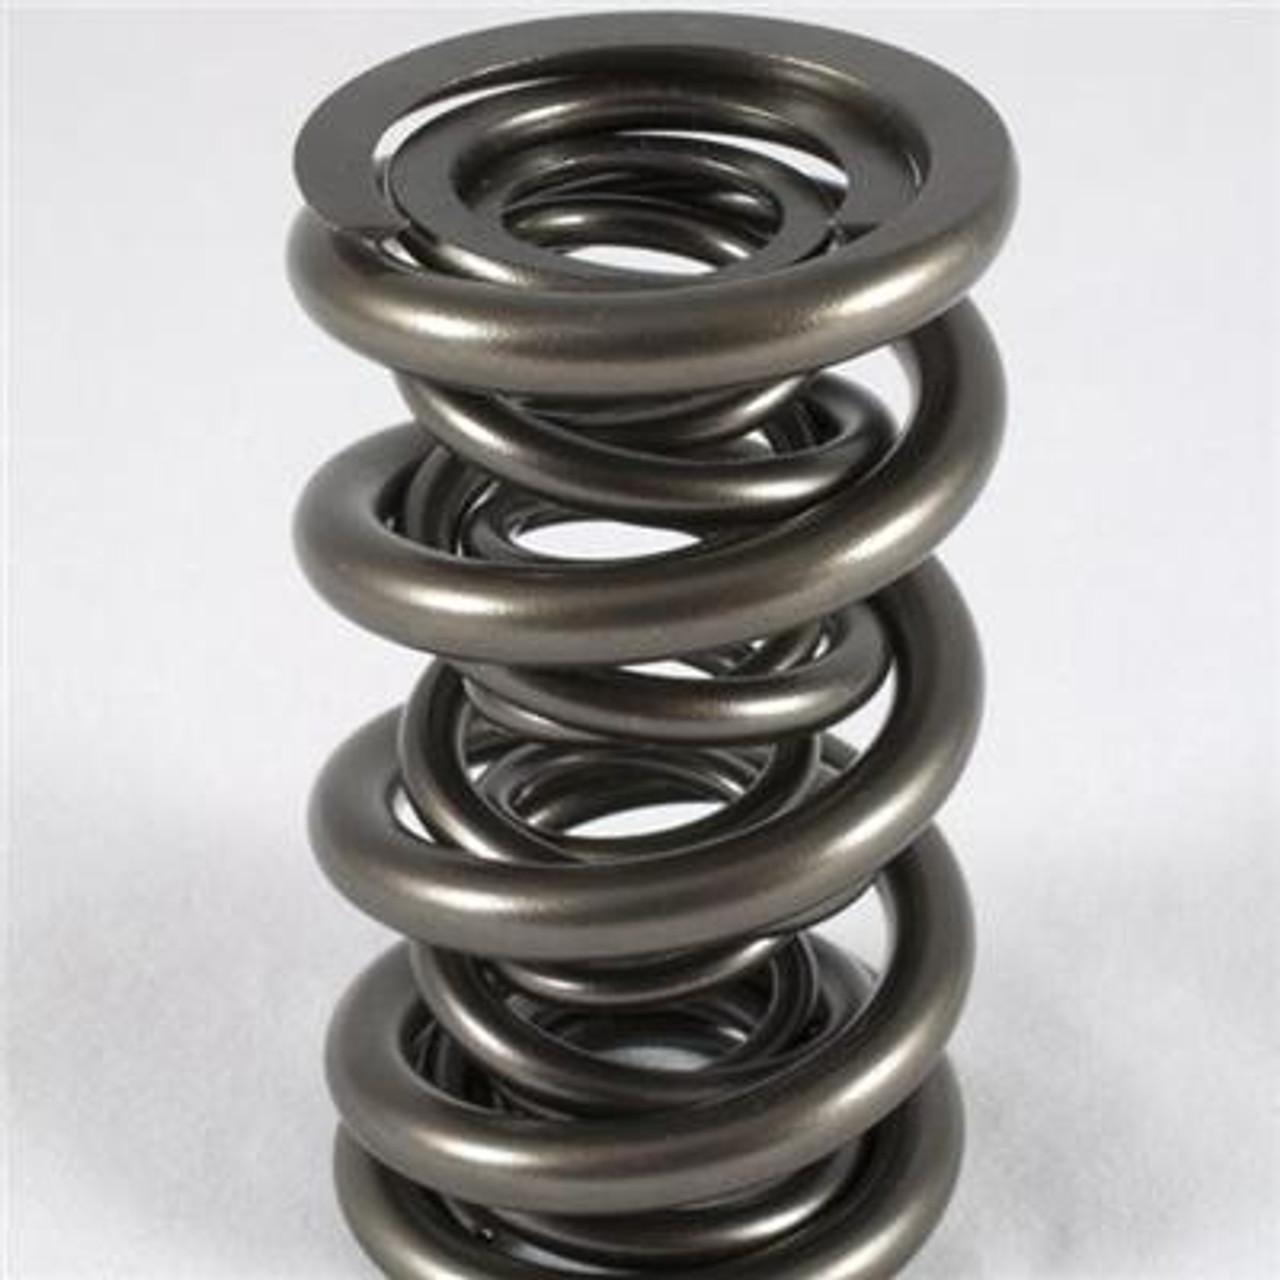 PAC-1249  •Seat Pressure: 375 LBS @ 2.200 Open Pressure: 1064 LBS @ 1.200 Coil Bind: 1.130 Max Lift: 1.000 16/pkg